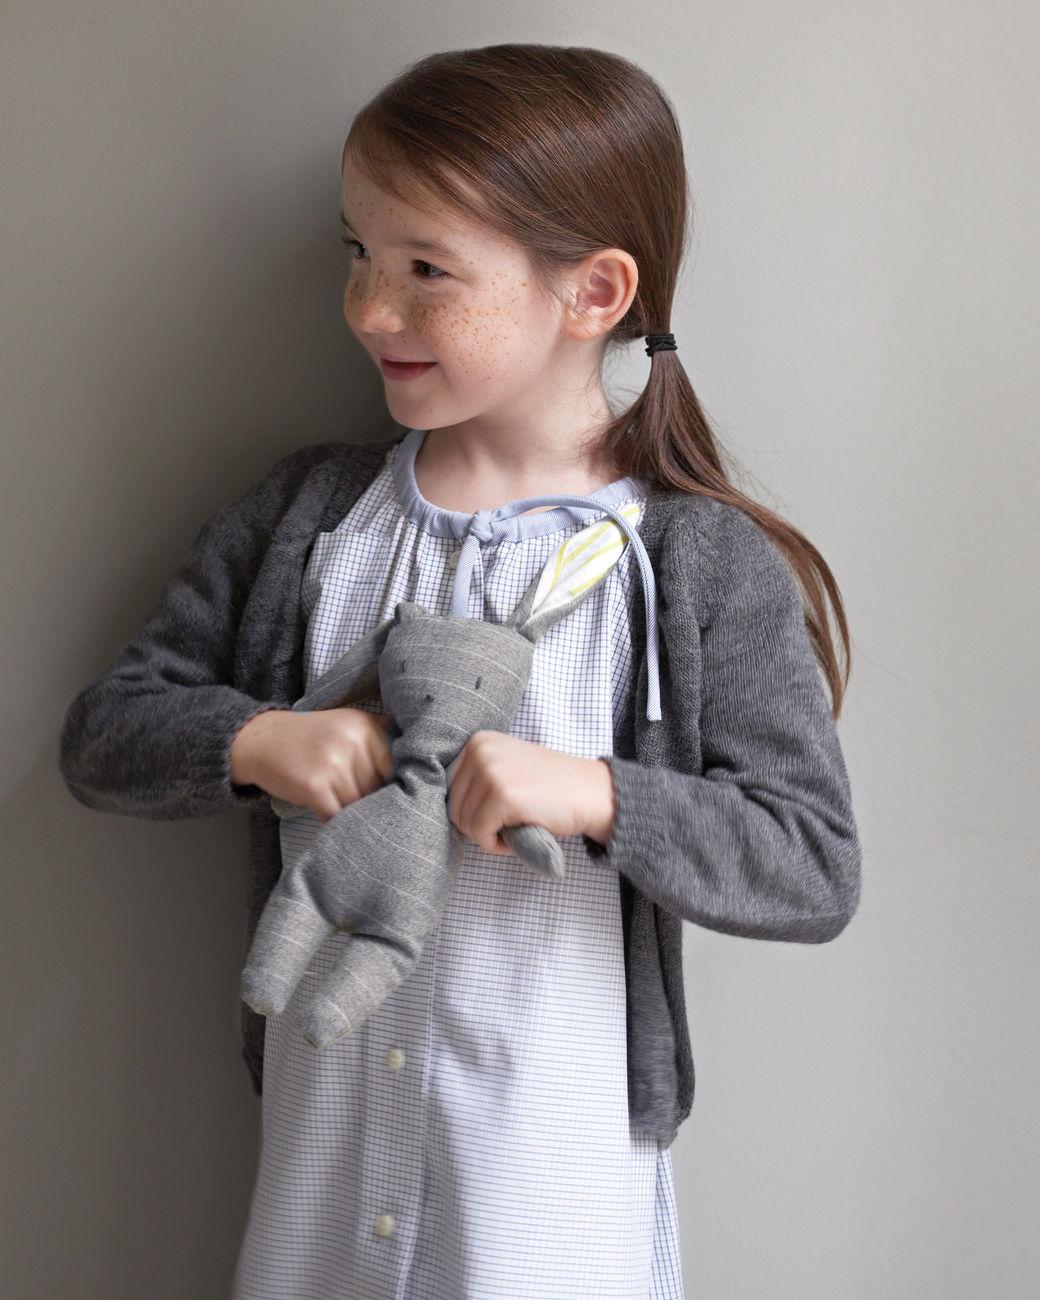 15+ Creative Ways To Repurpose Men's Shirt Into Little Girl's Dress -- Girl's Shirt Dress